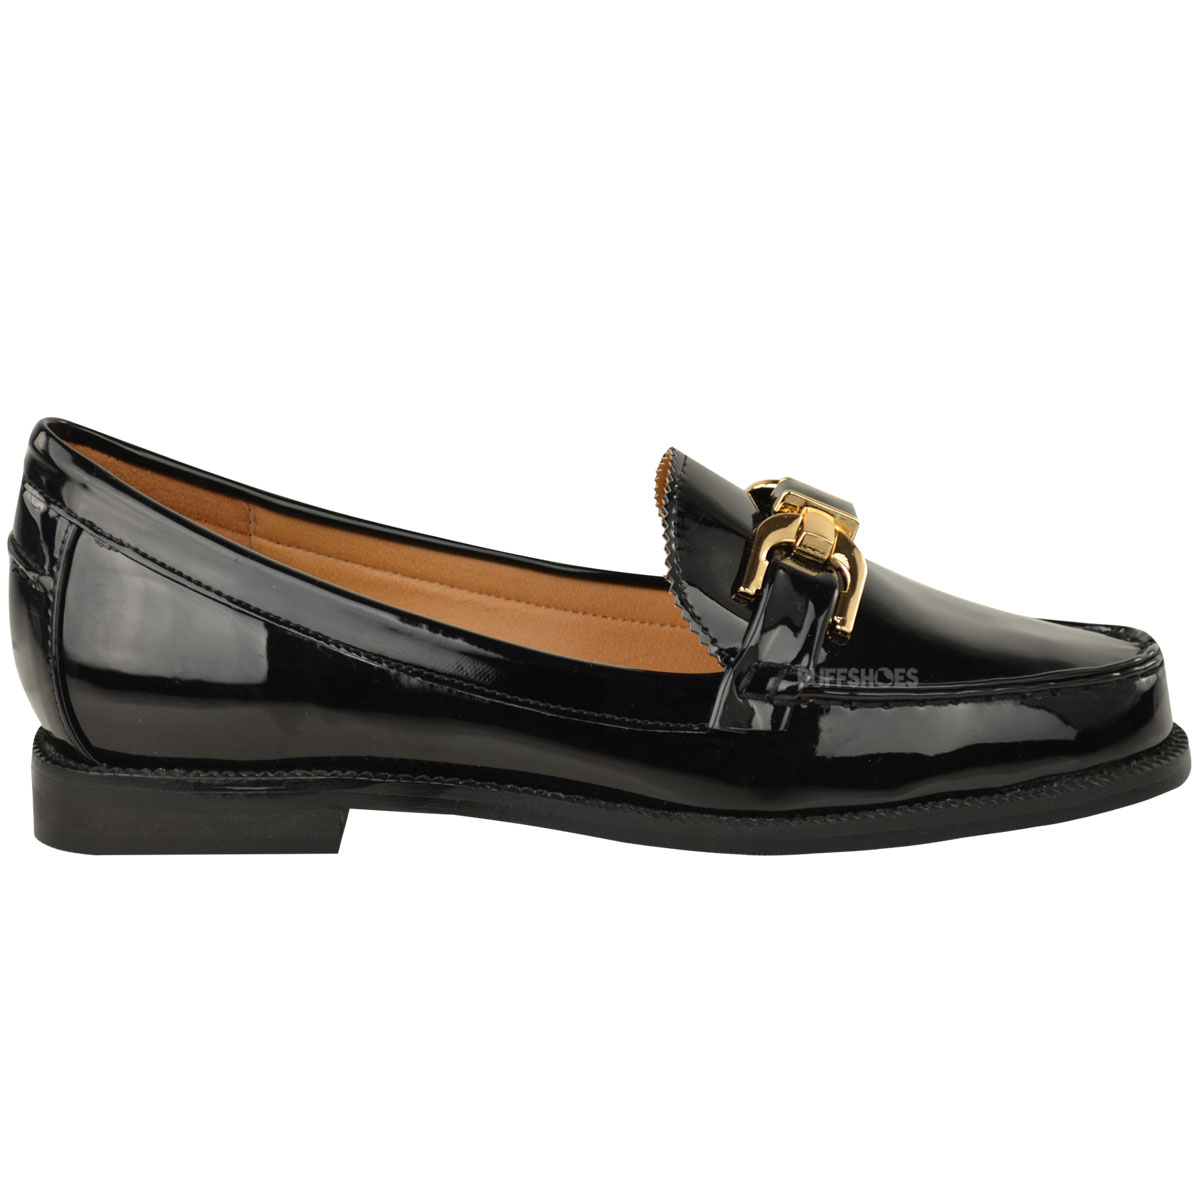 loafers brogues low heel shoes womens school formal